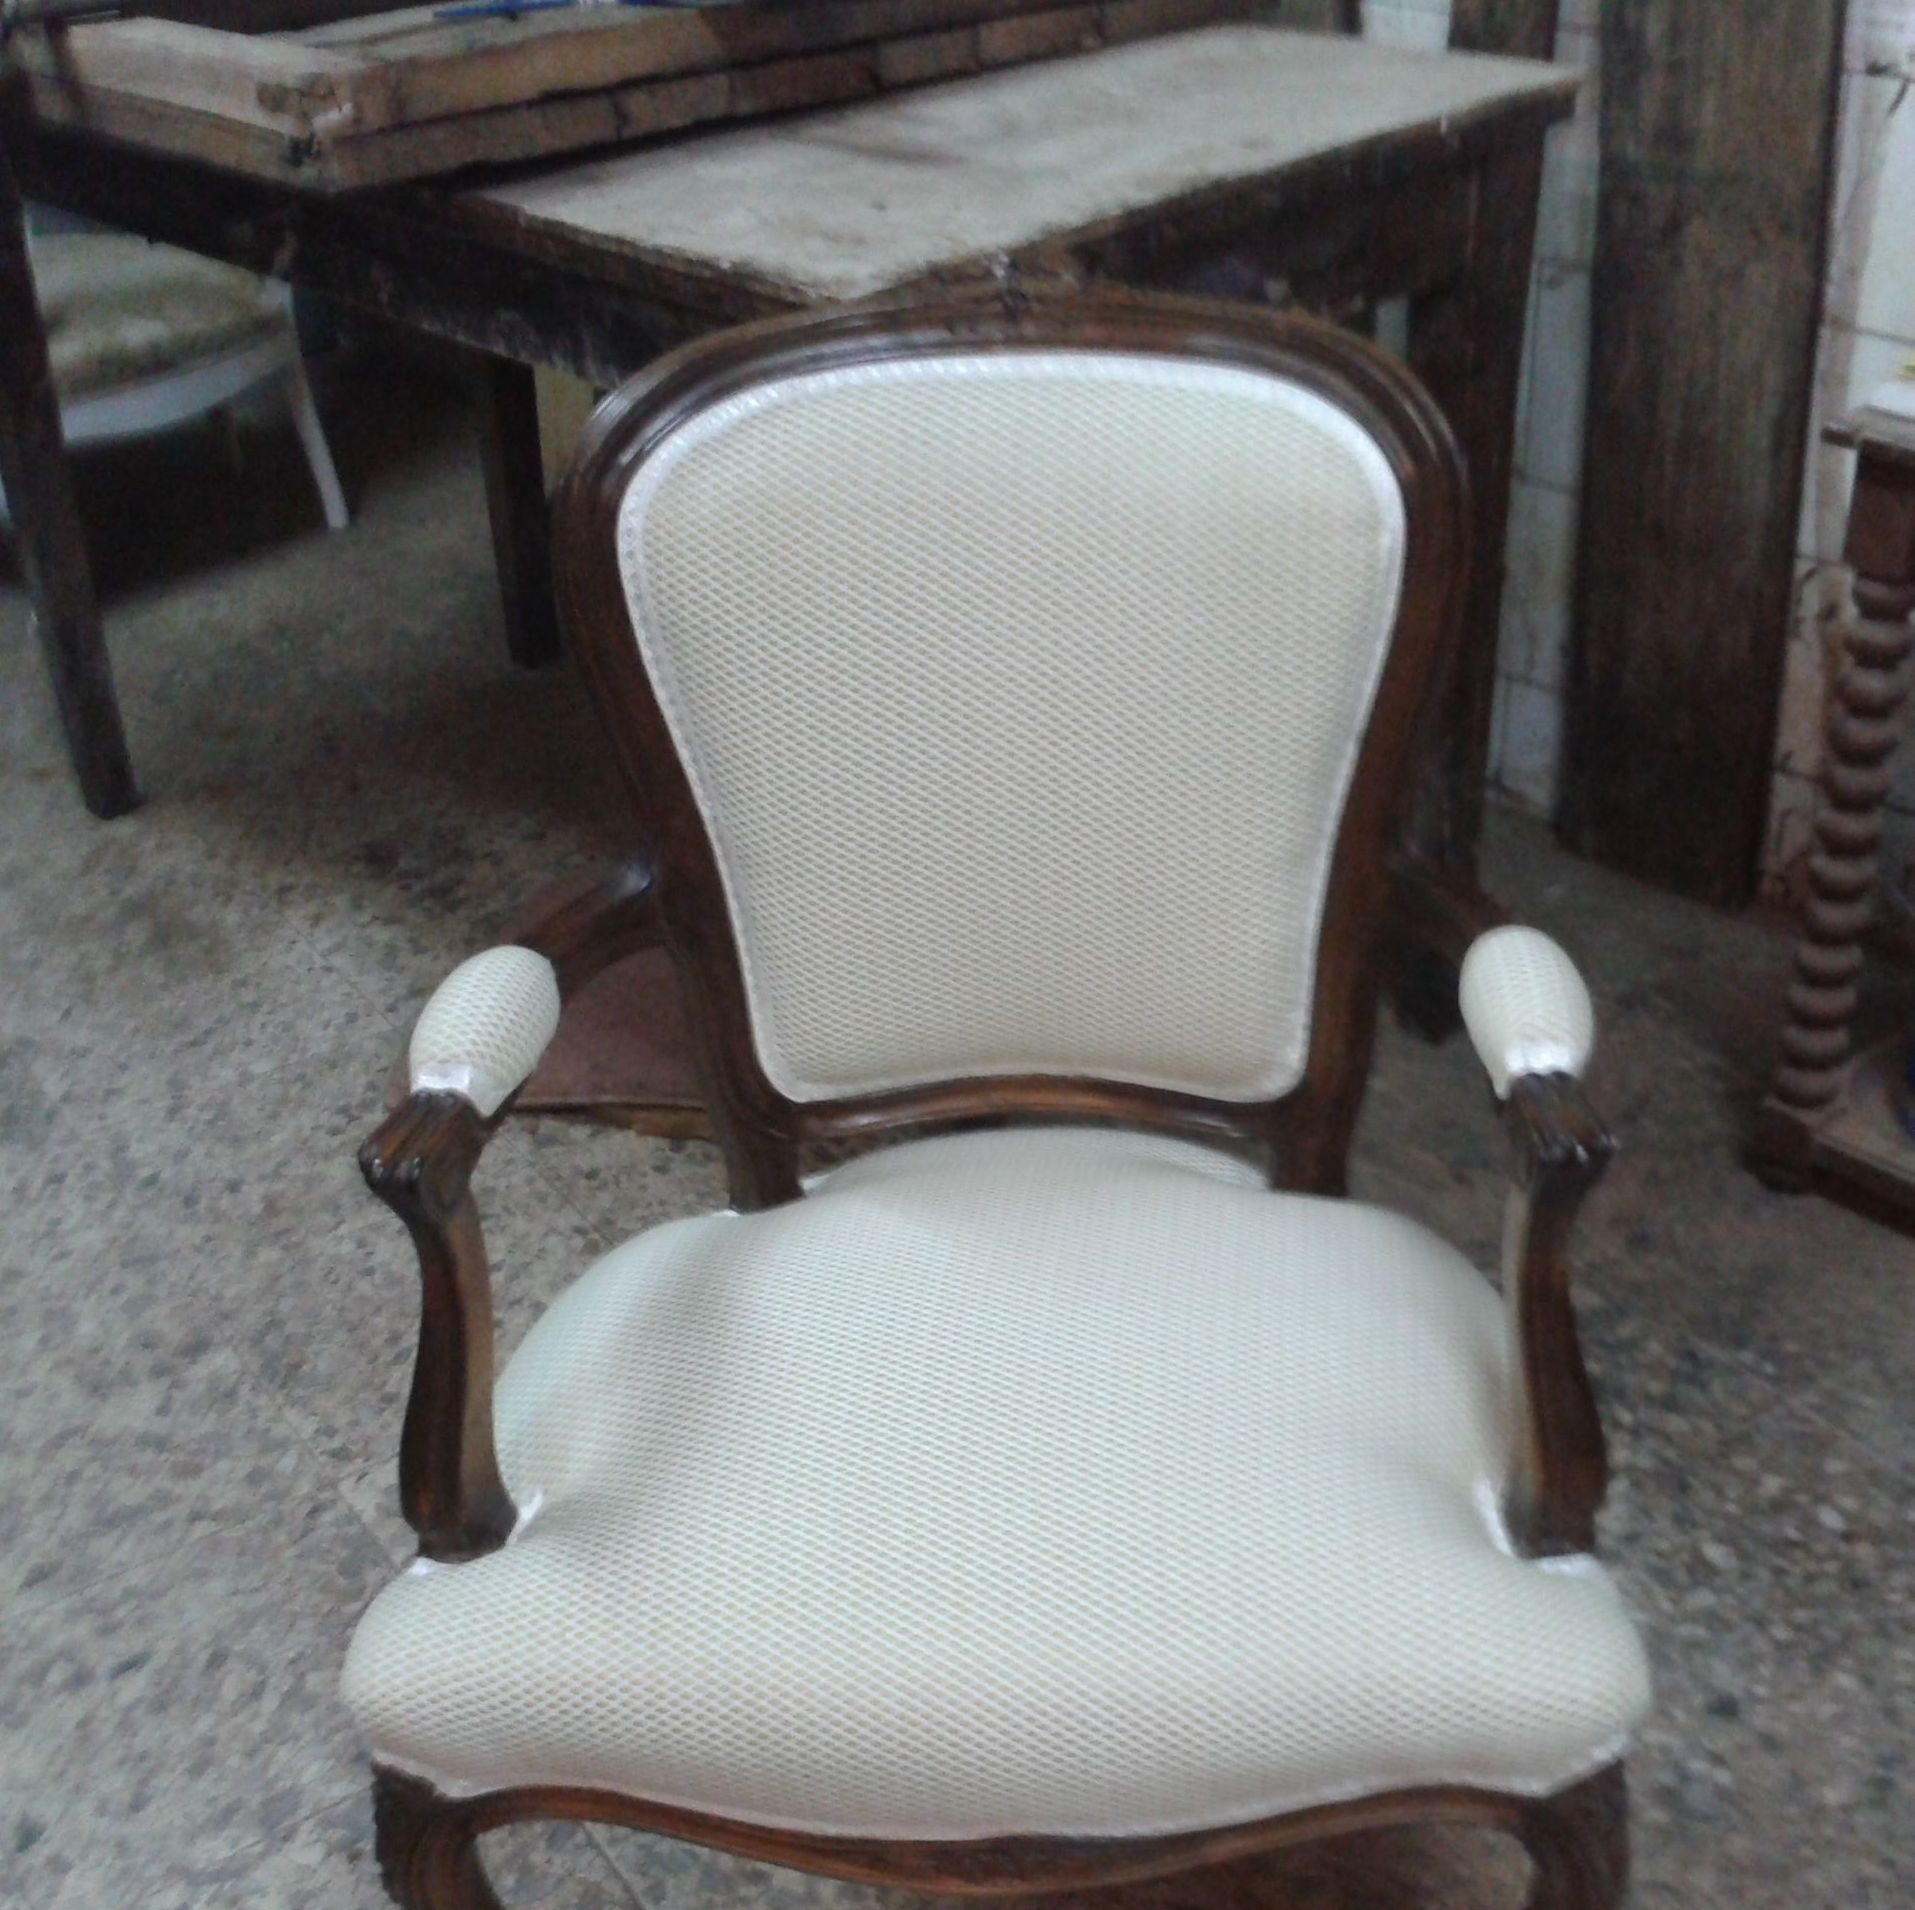 Foto 60 de Restauración de muebles en Pamplona | Lendik Restauración